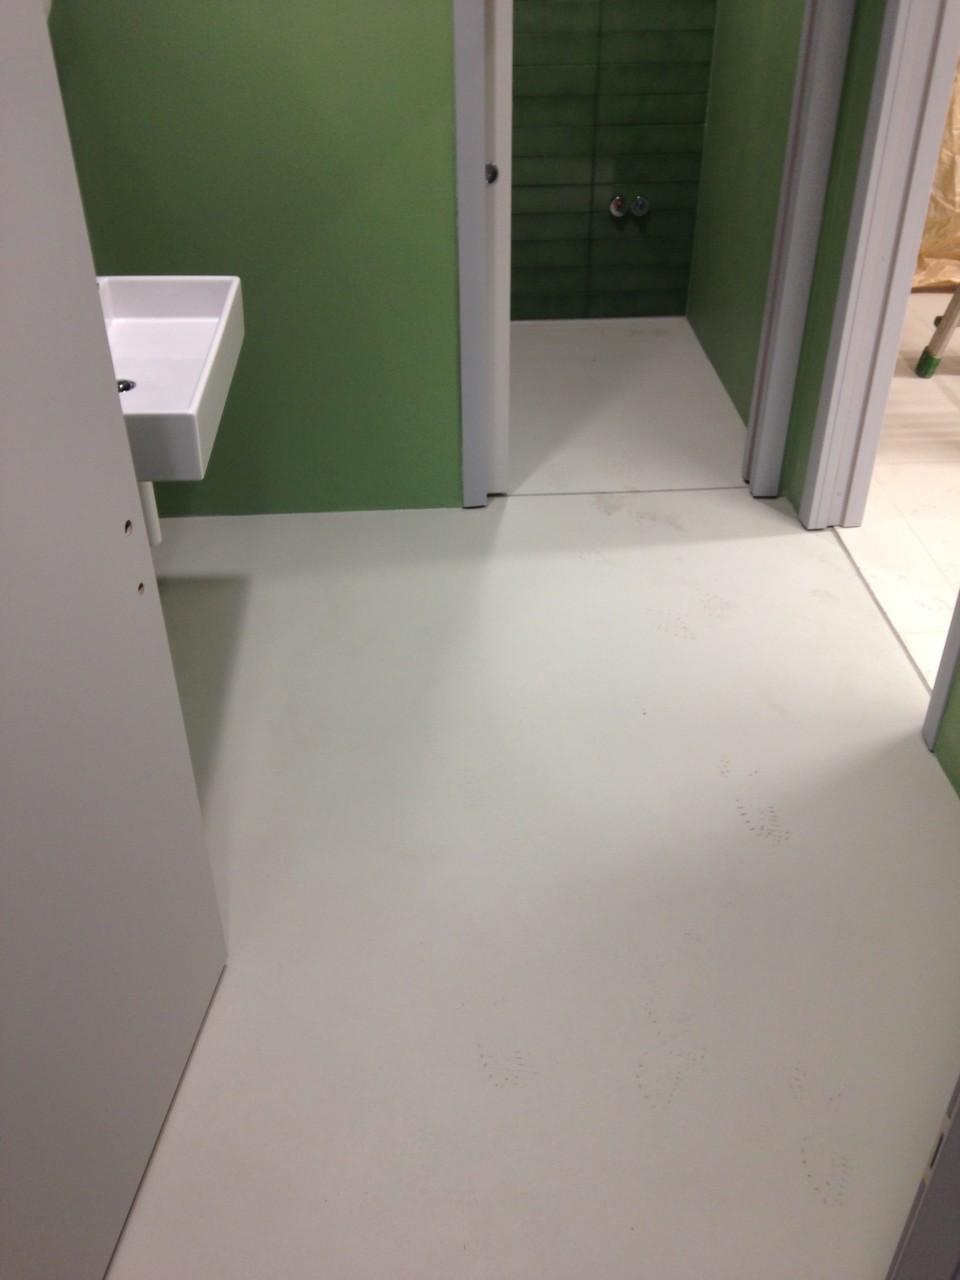 Lavandino bagno cementobagno pavimento cemento : lavandino bagno ...